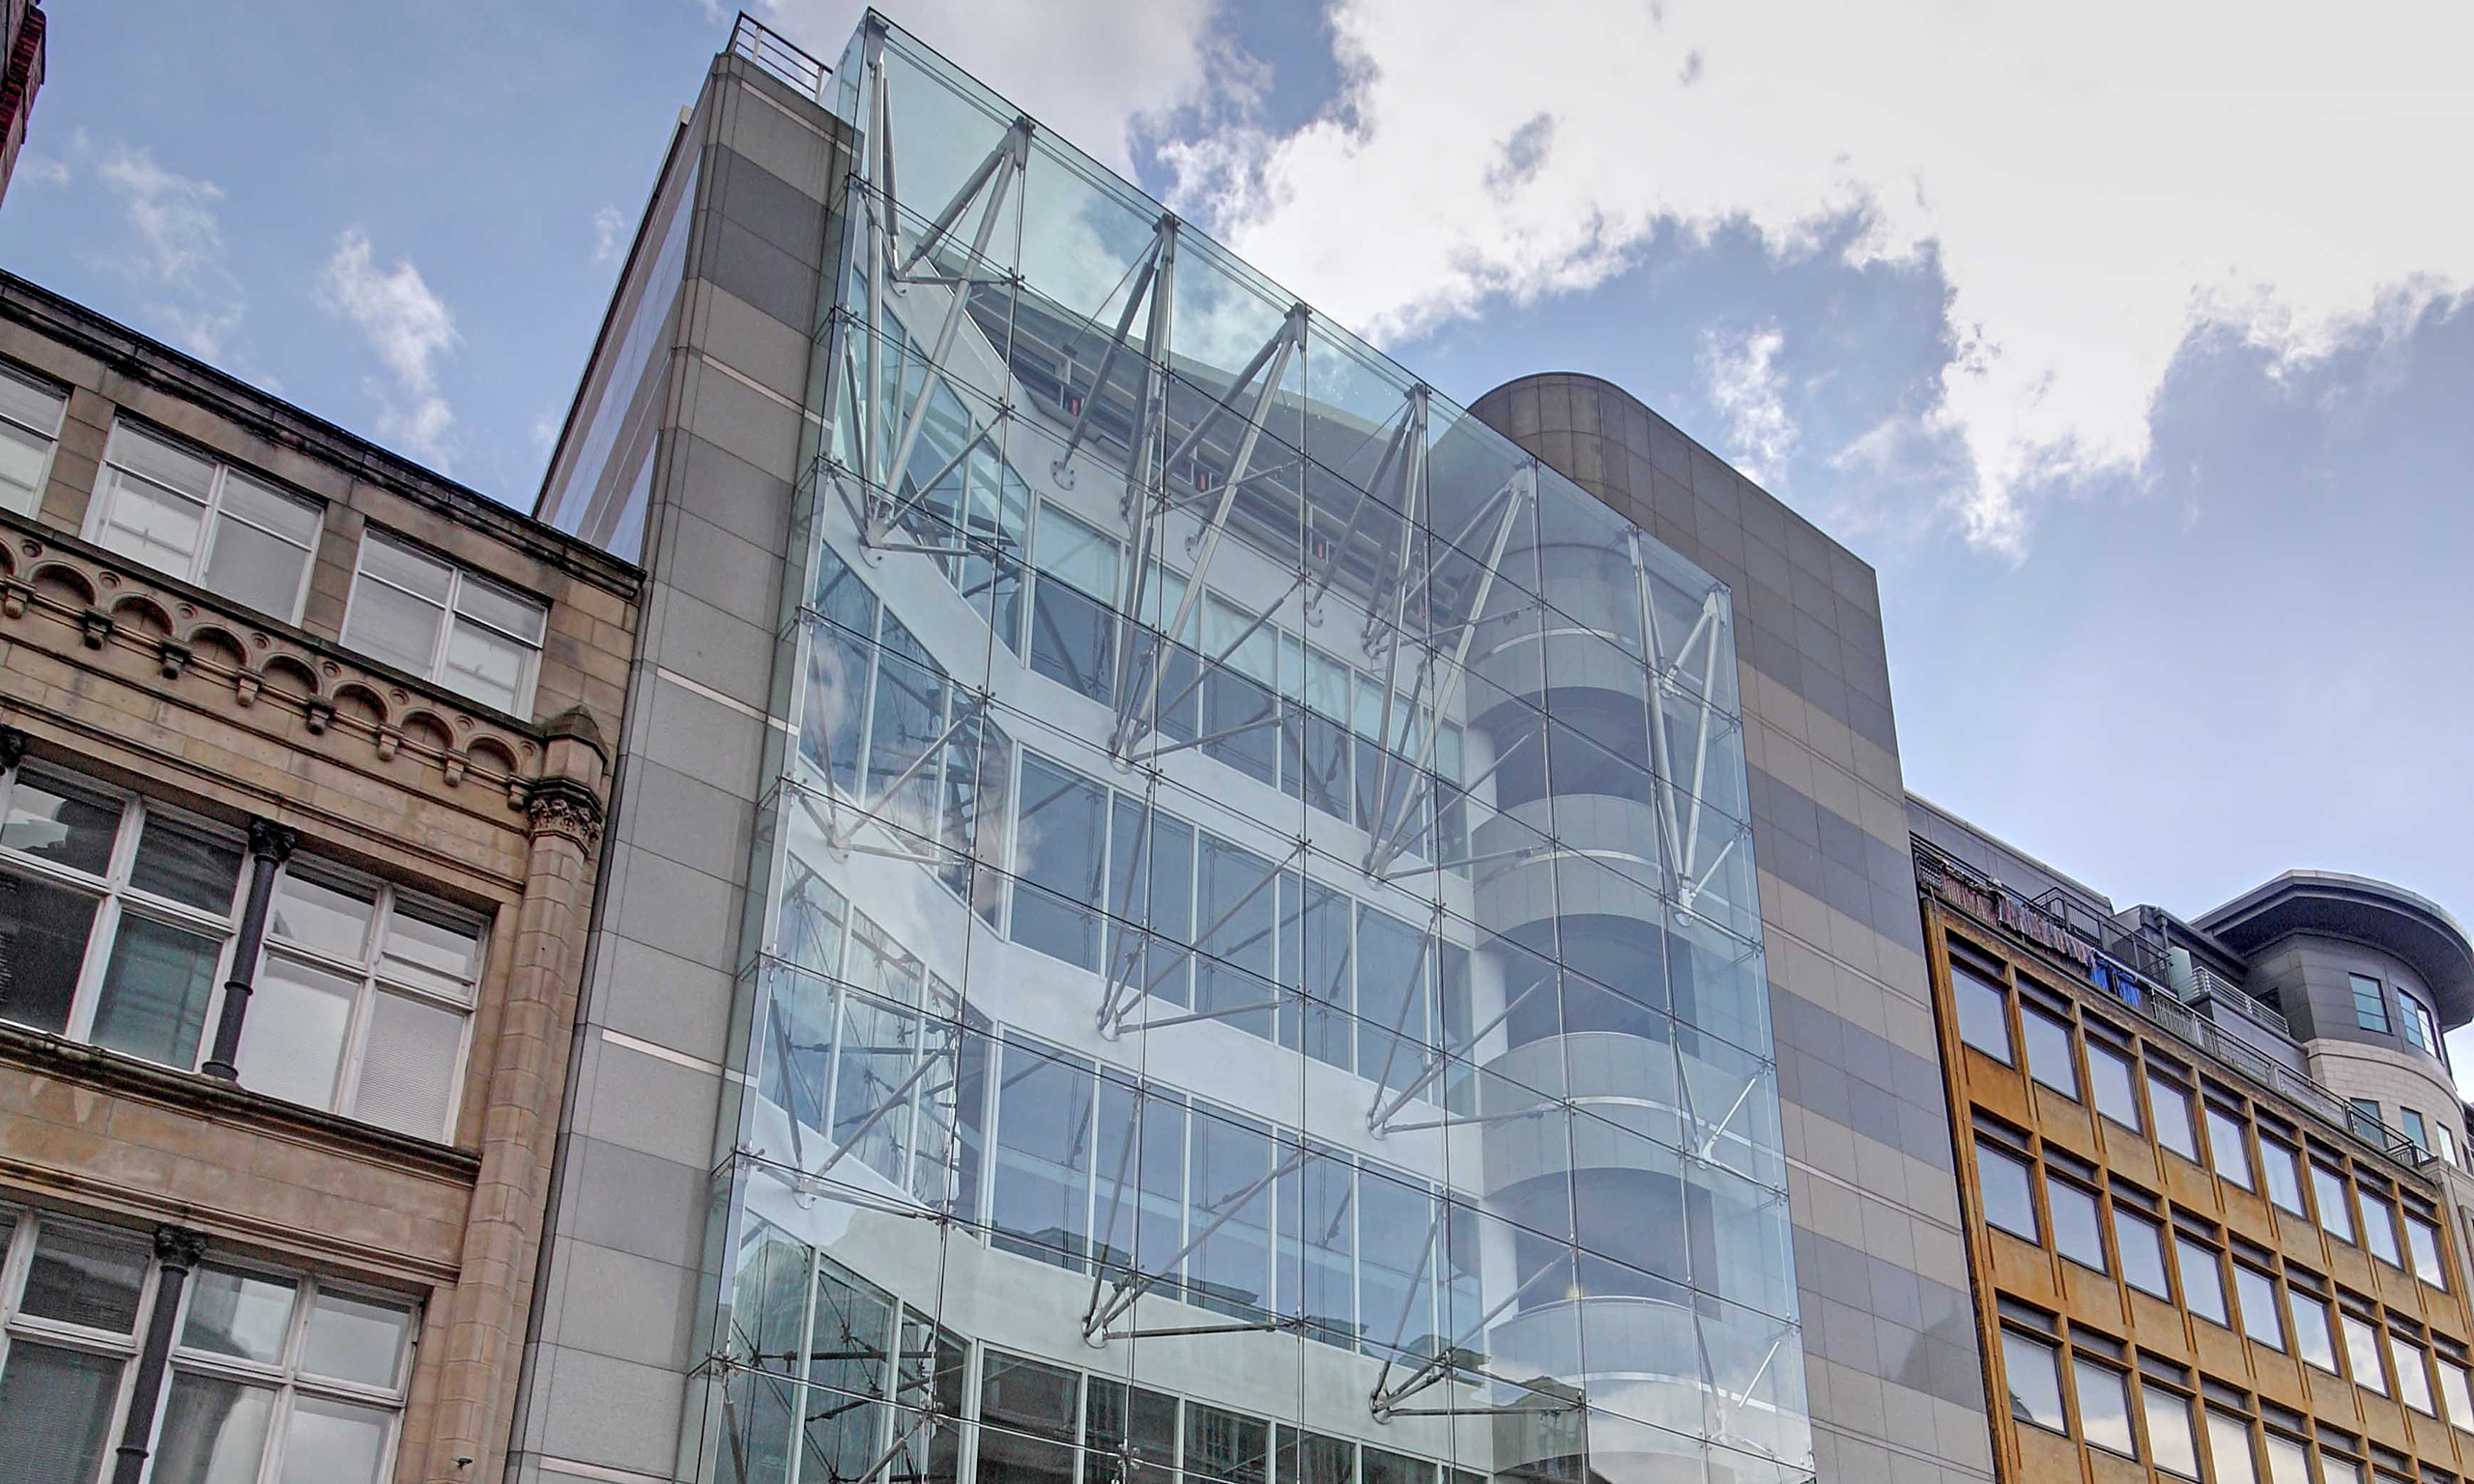 University of Law announces new Leeds City centre location